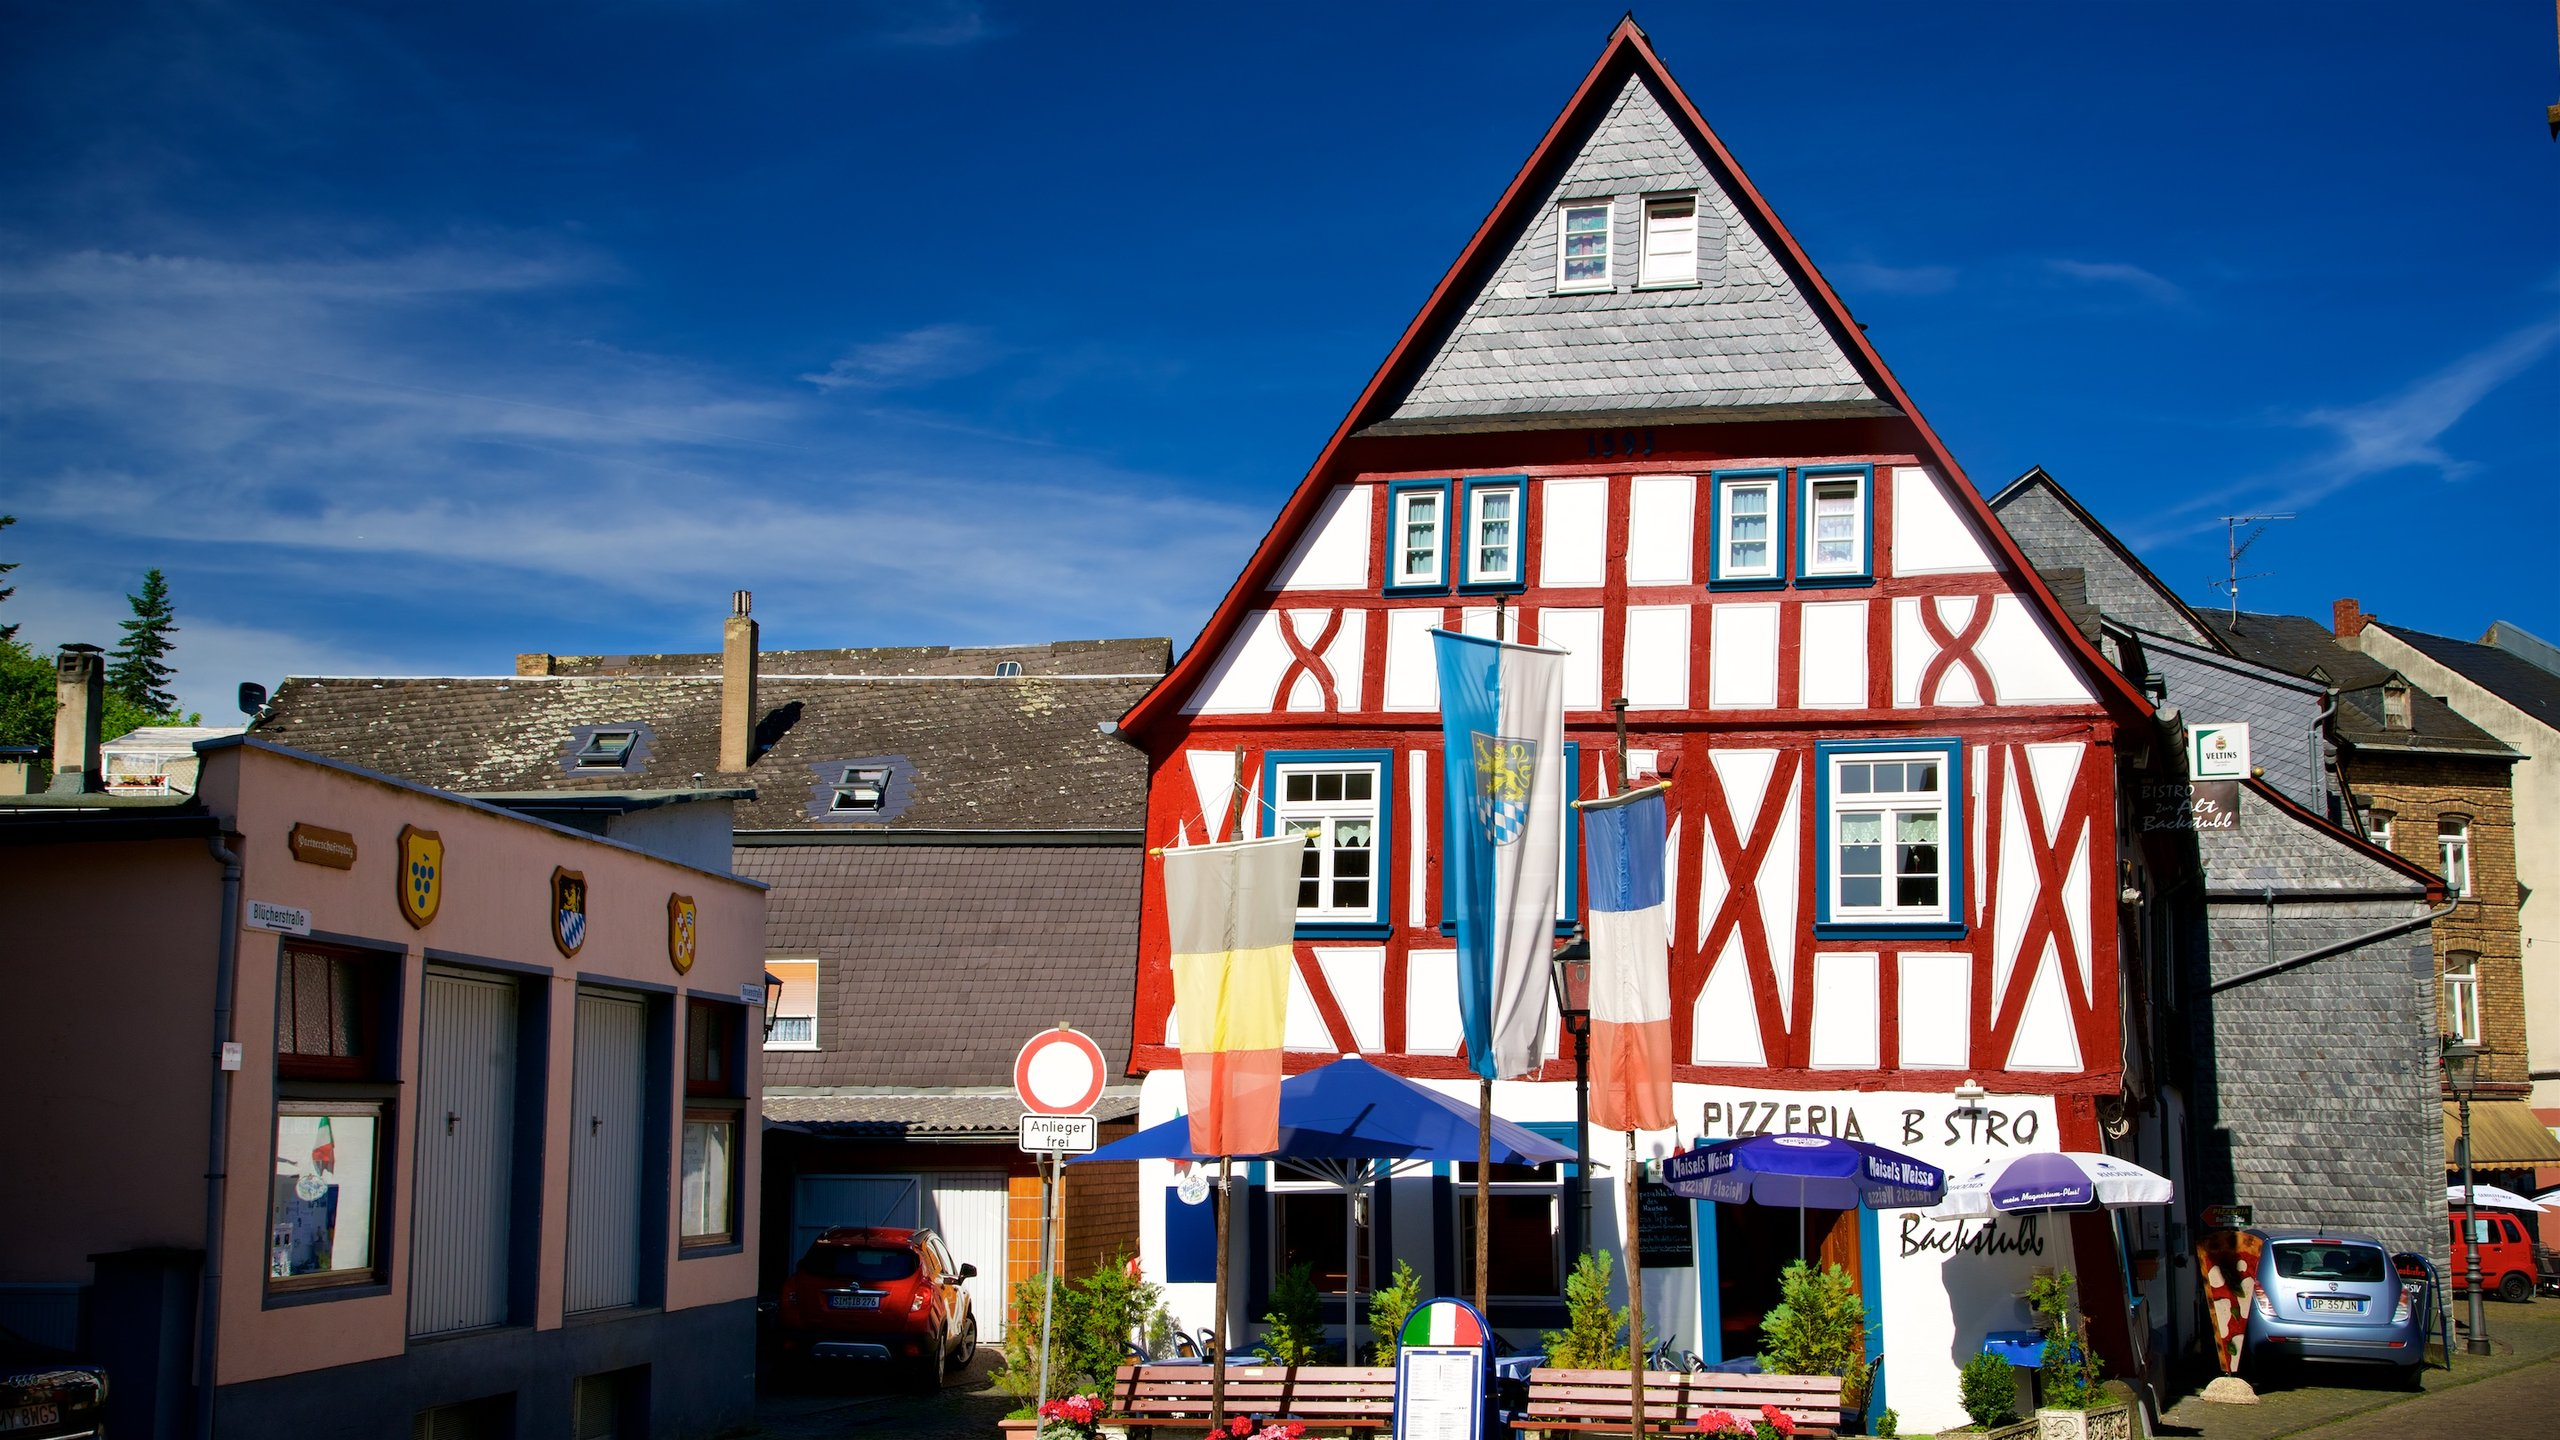 Mainz-Bingen, Rhineland-Palatinate, Germany